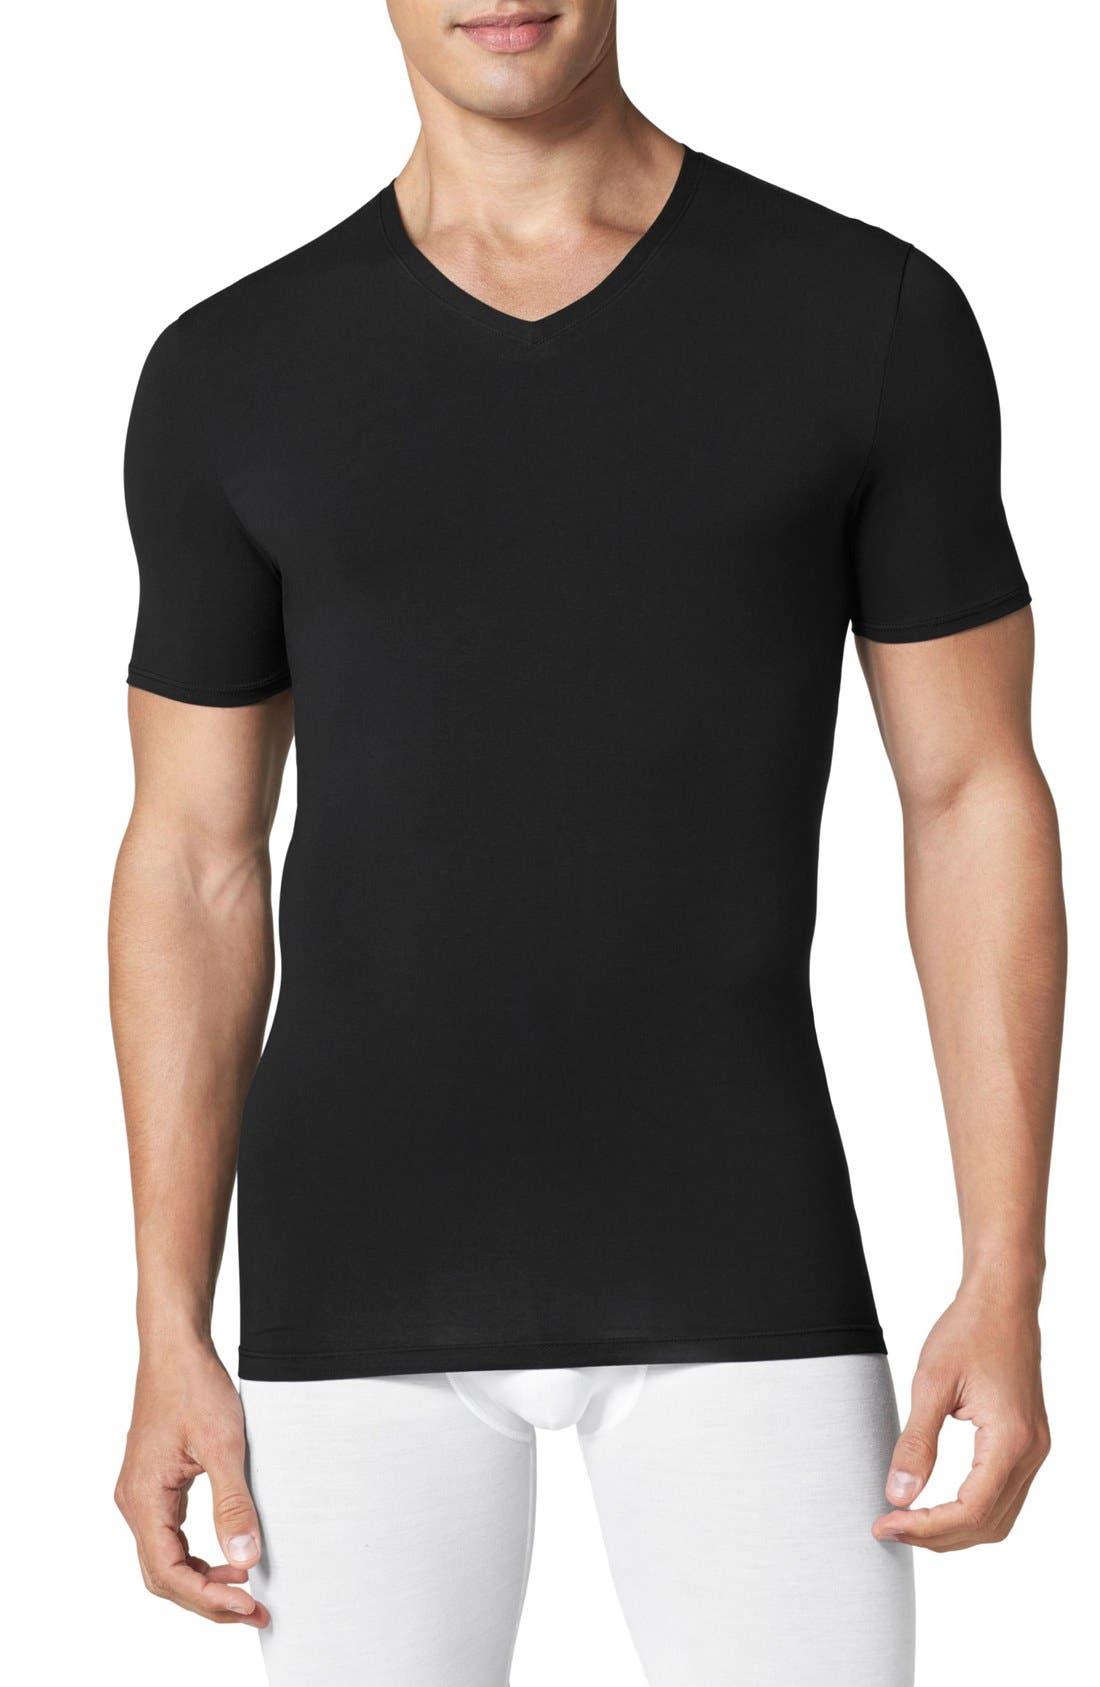 Alternate Image 1 Selected - Tommy John 'Cool Cotton' High V-Neck Undershirt